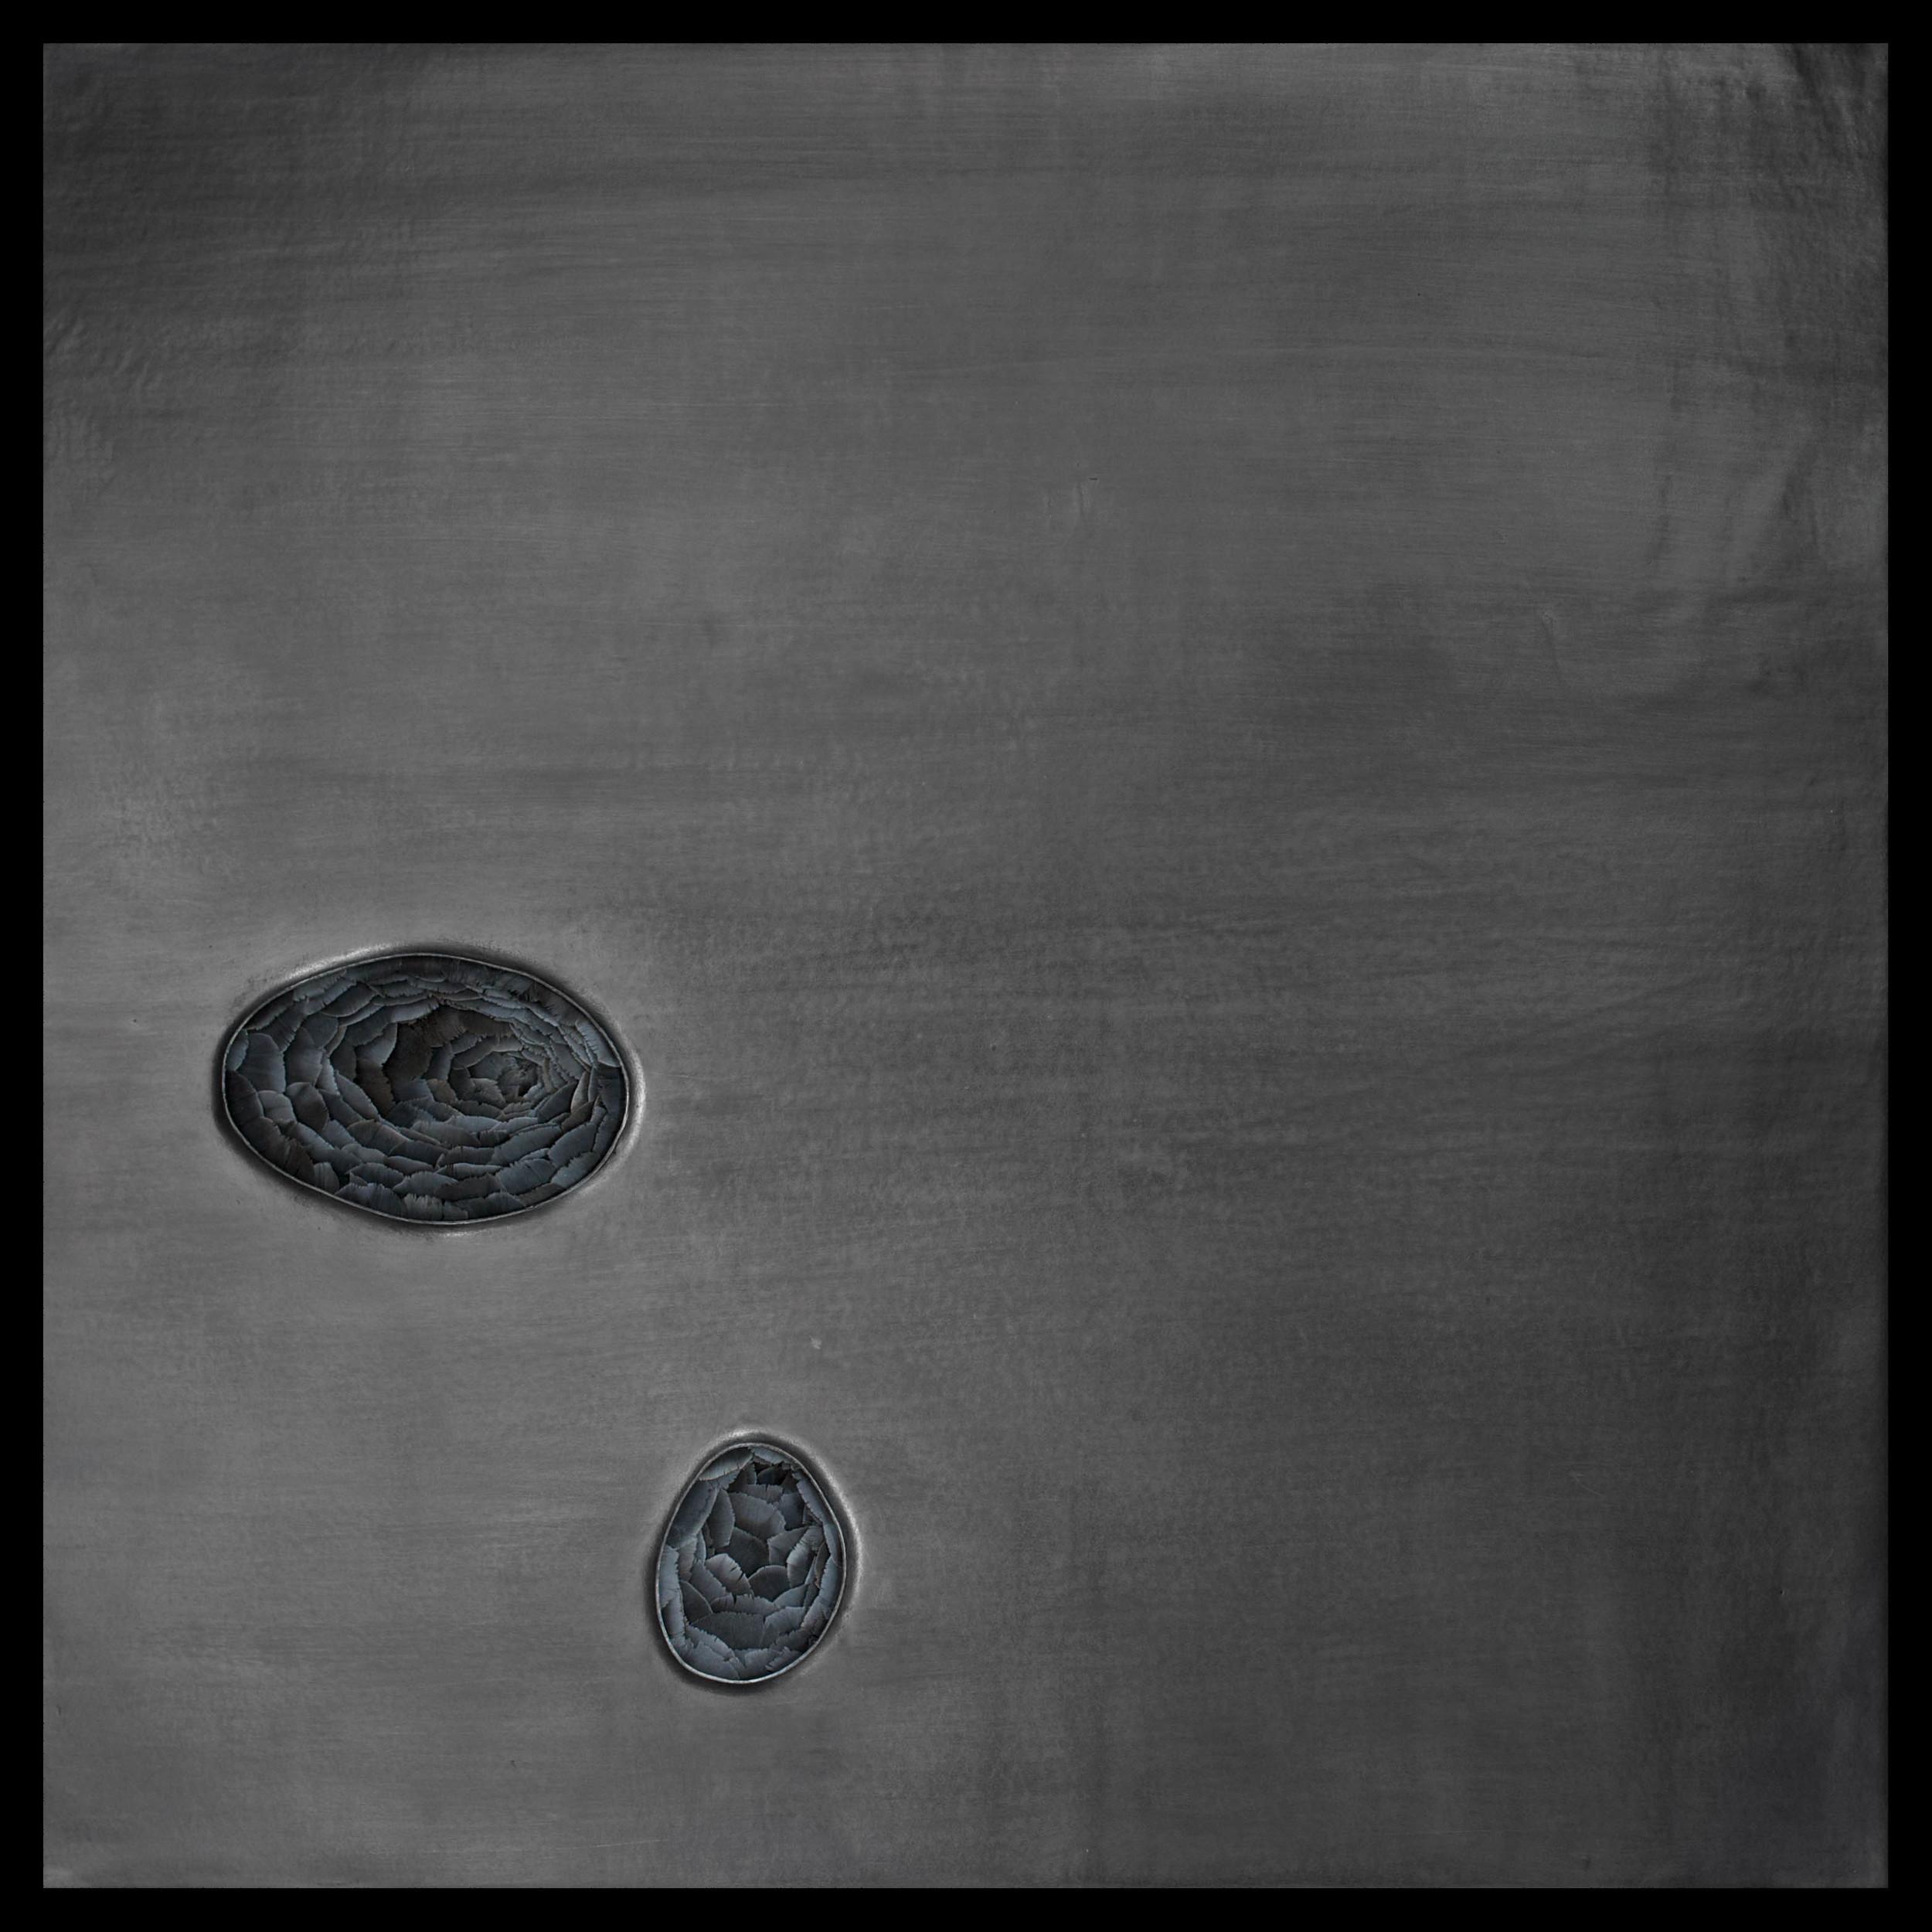 Stigma (Pinion), 2015, Kate MccGwire